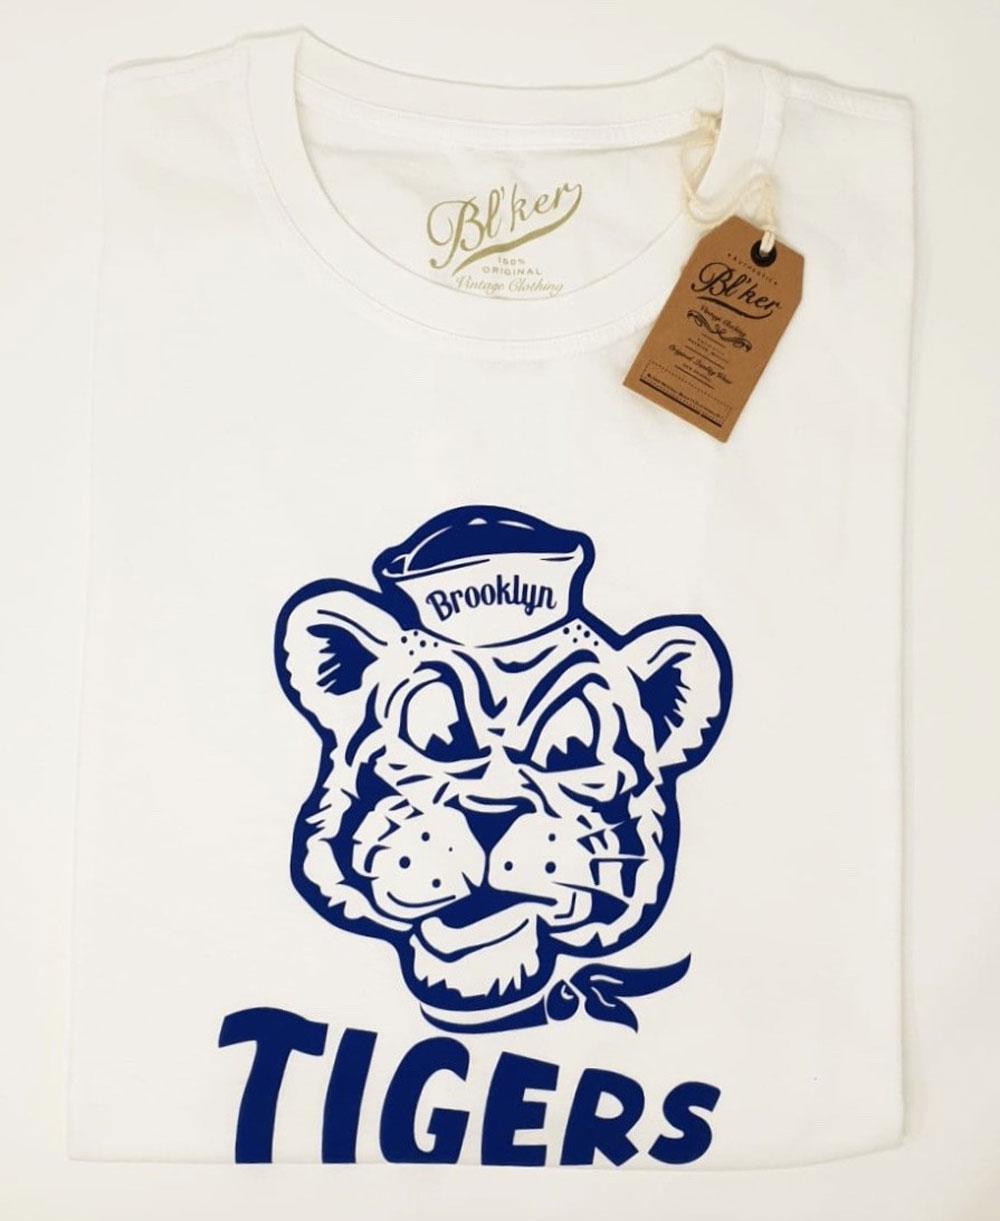 Brooklyn Tiger T-Shirt Manica Corta Uomo White